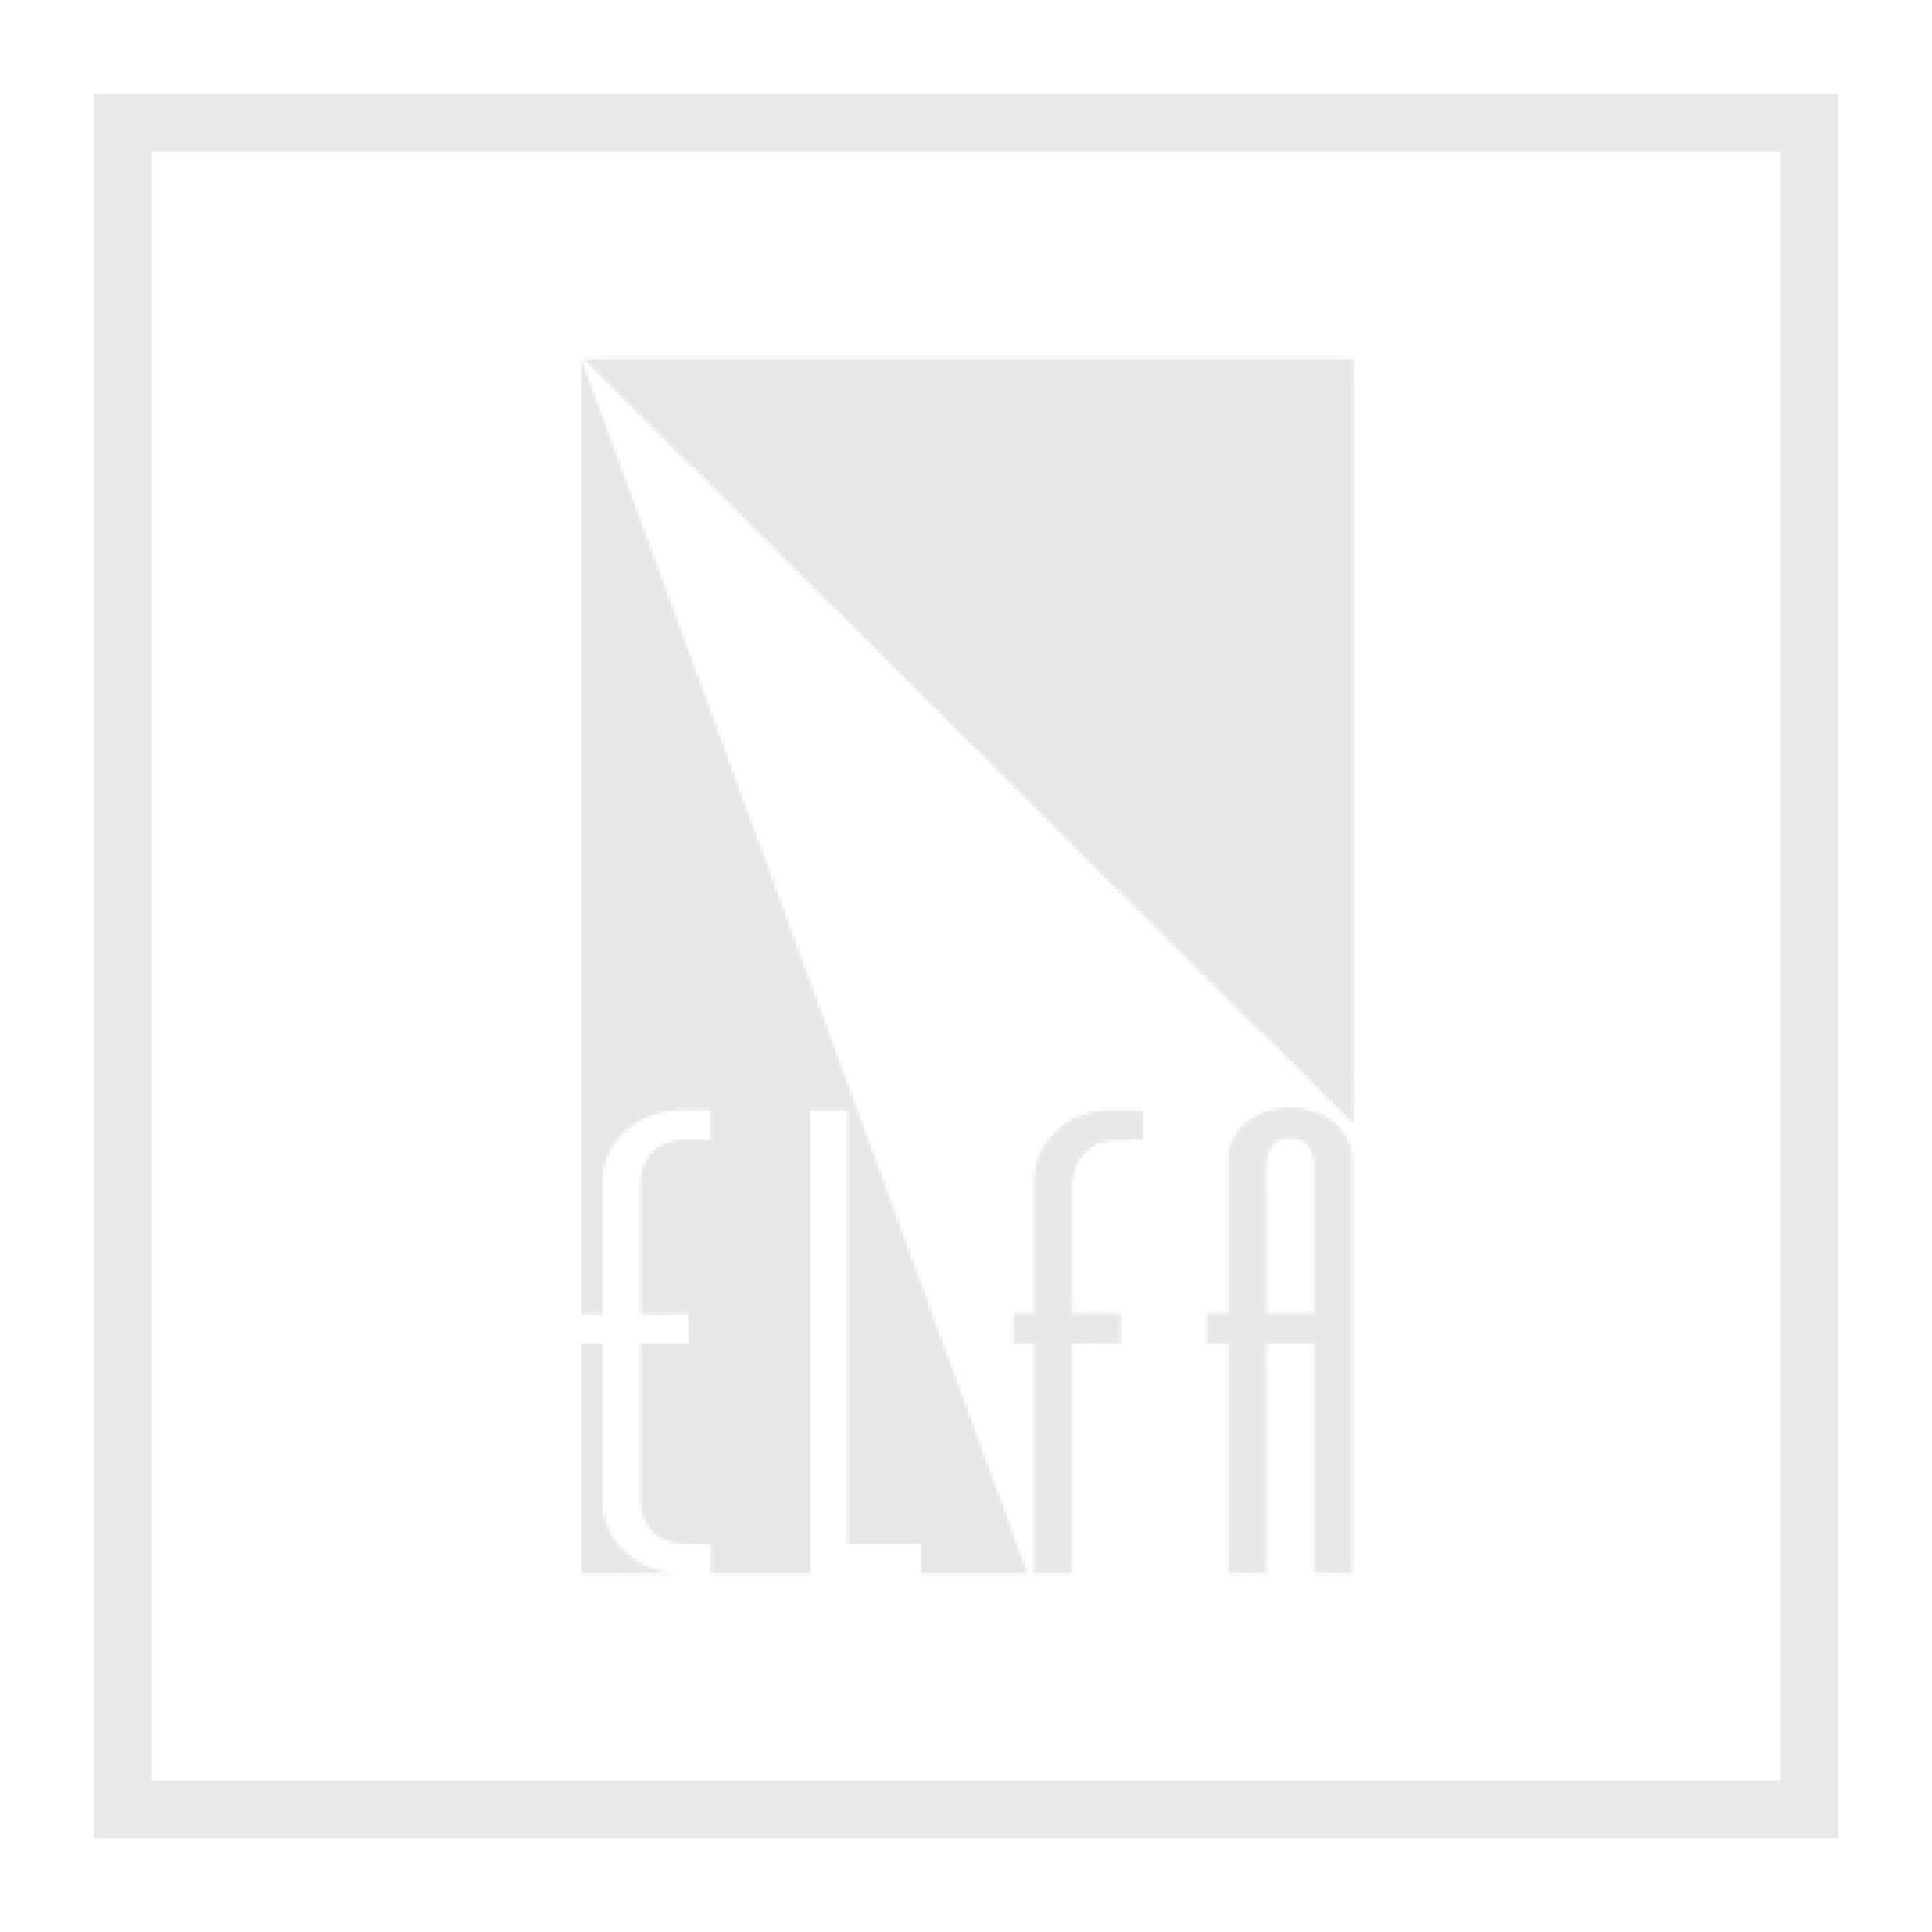 Coast HP7R zaklamp Focus Set accessoires inc.2xLi-ion & 4xAAA box